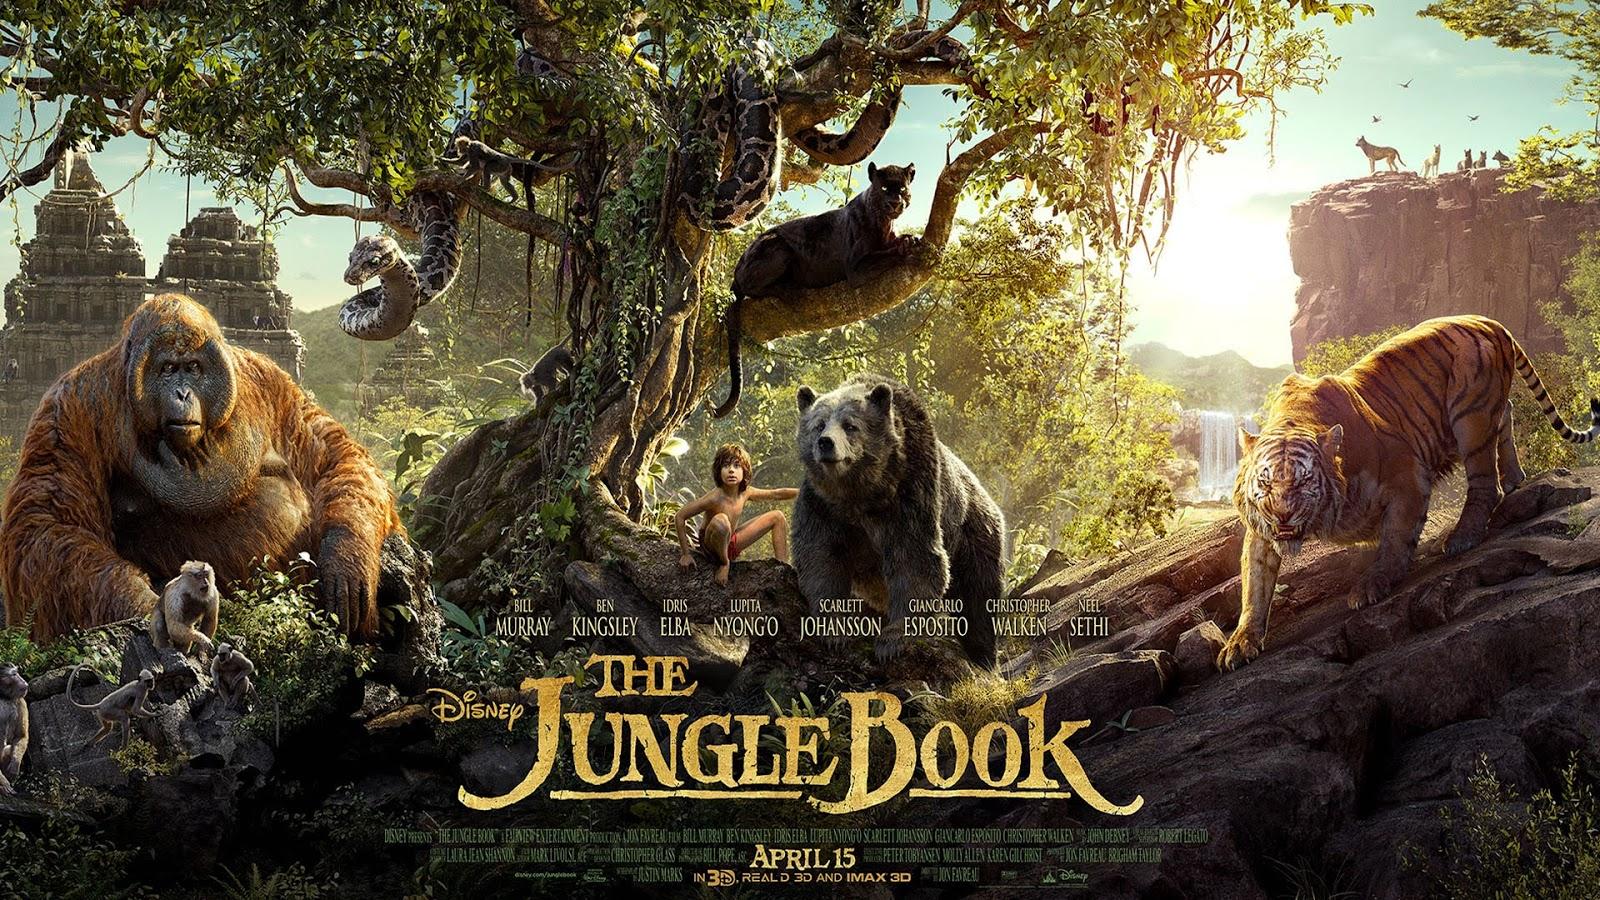 jungle book must watch - day 944 - bhawana somaaya